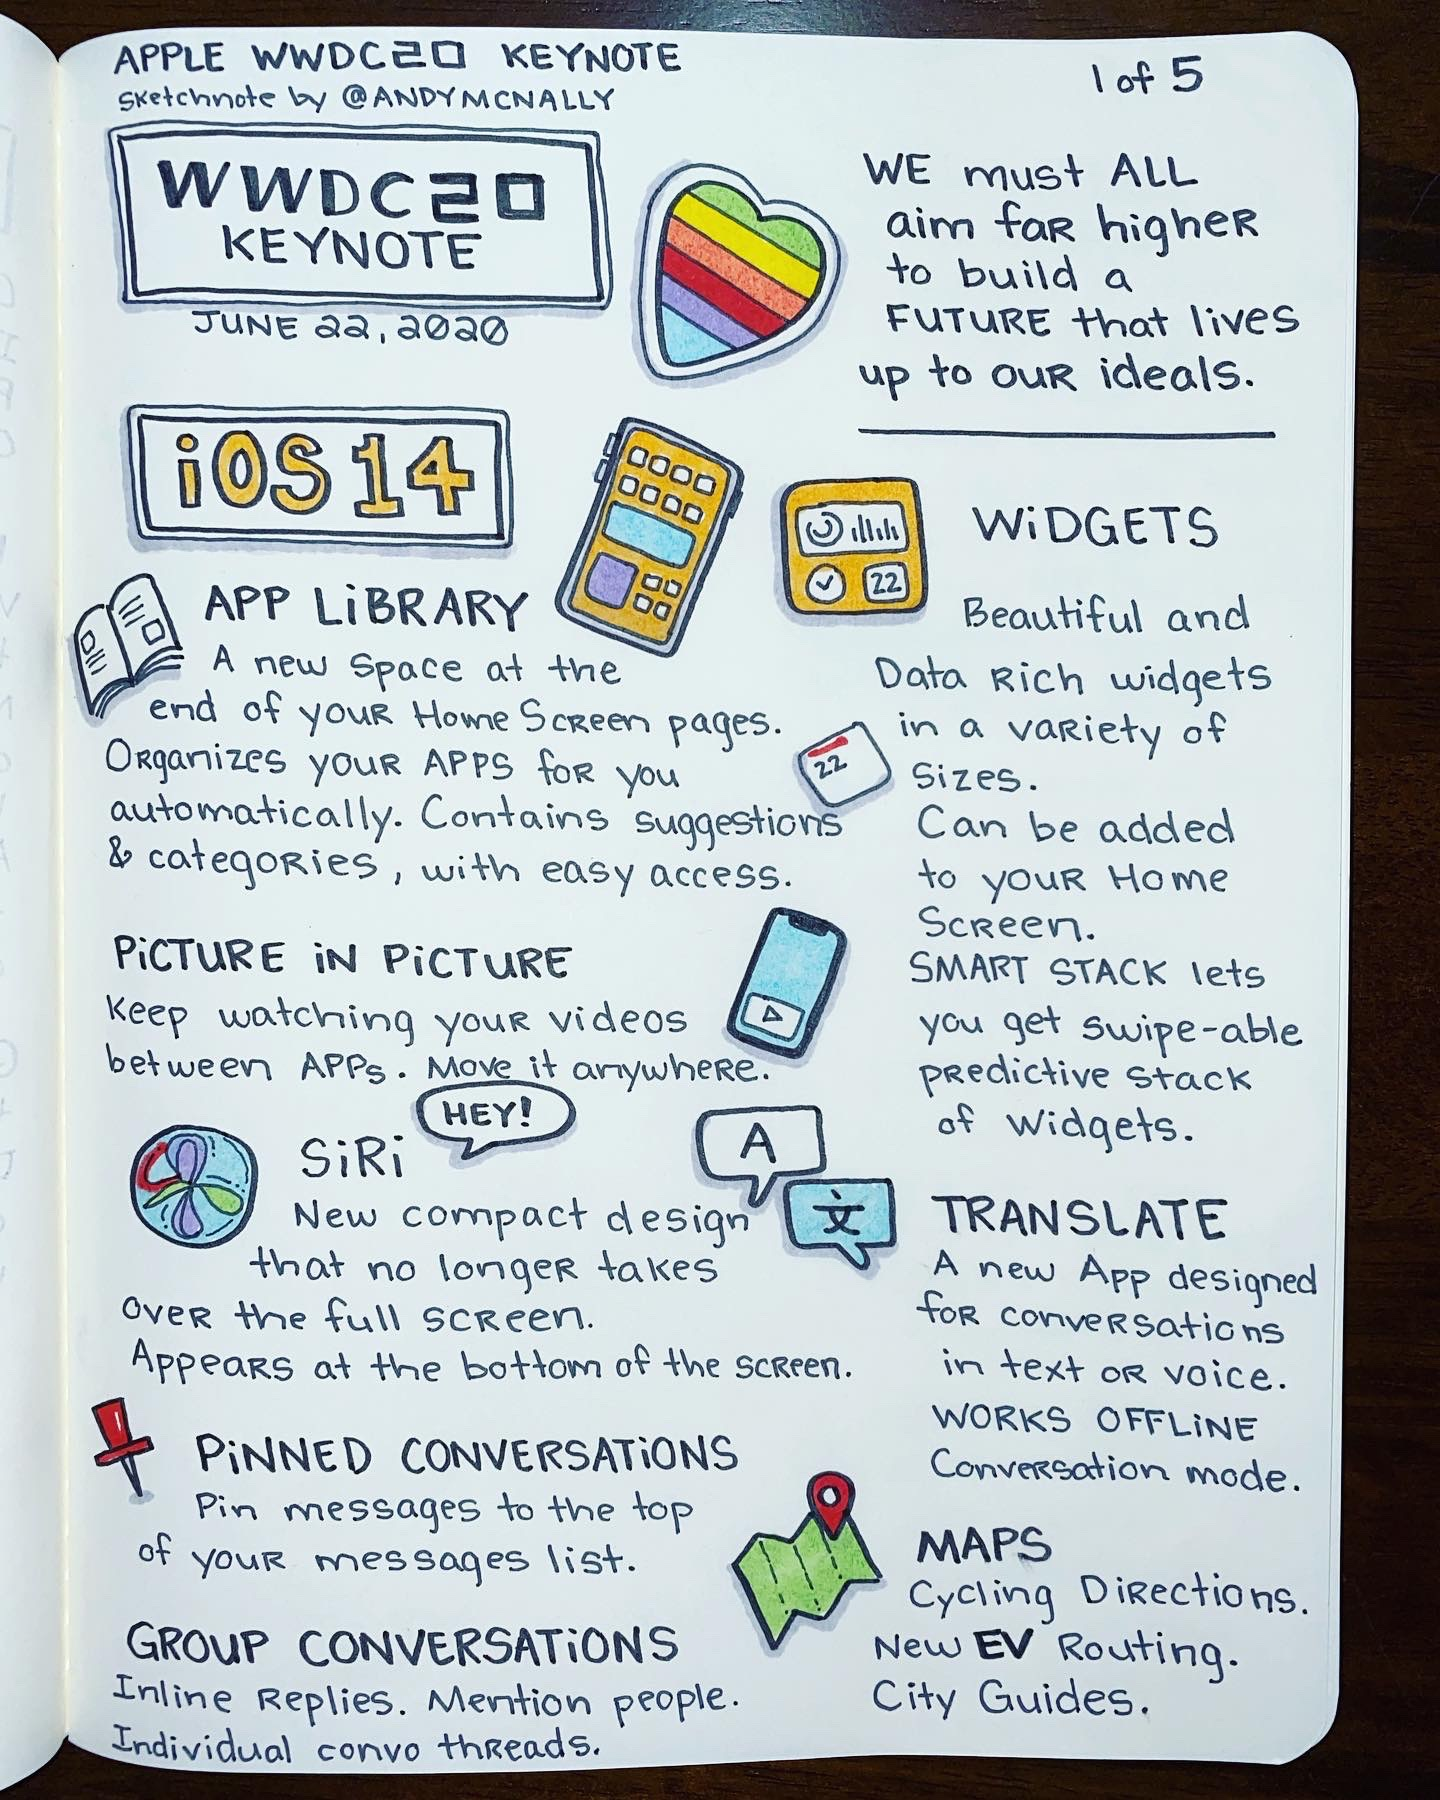 Apple WWDC 2020 Keynote drawing 1 of 5